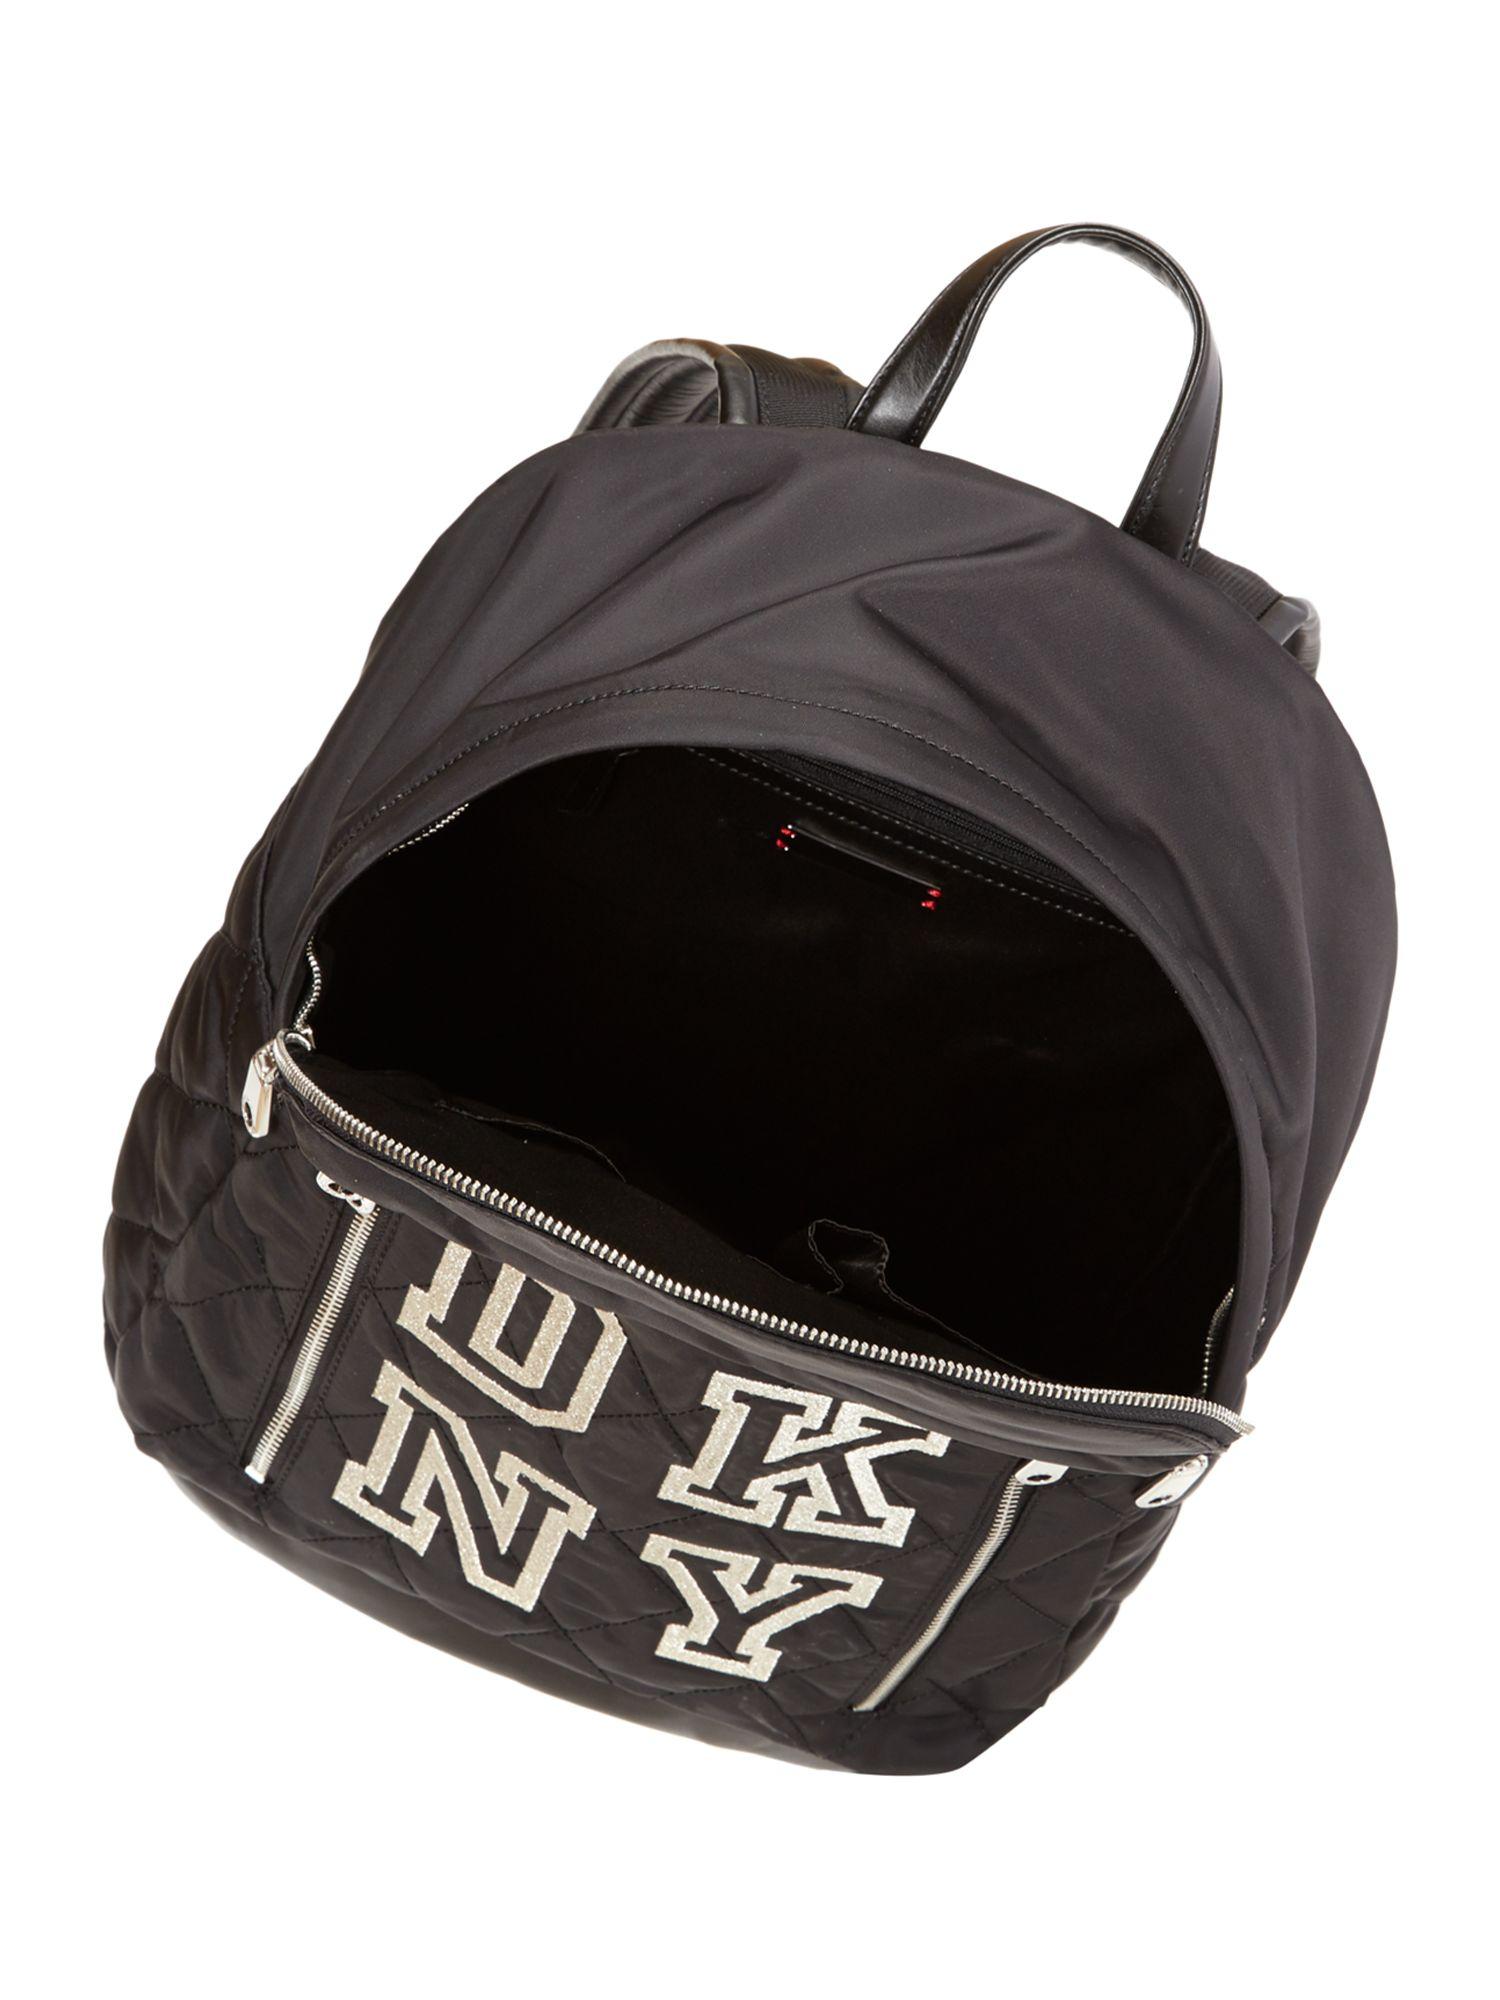 dkny black nylon backpack in black lyst